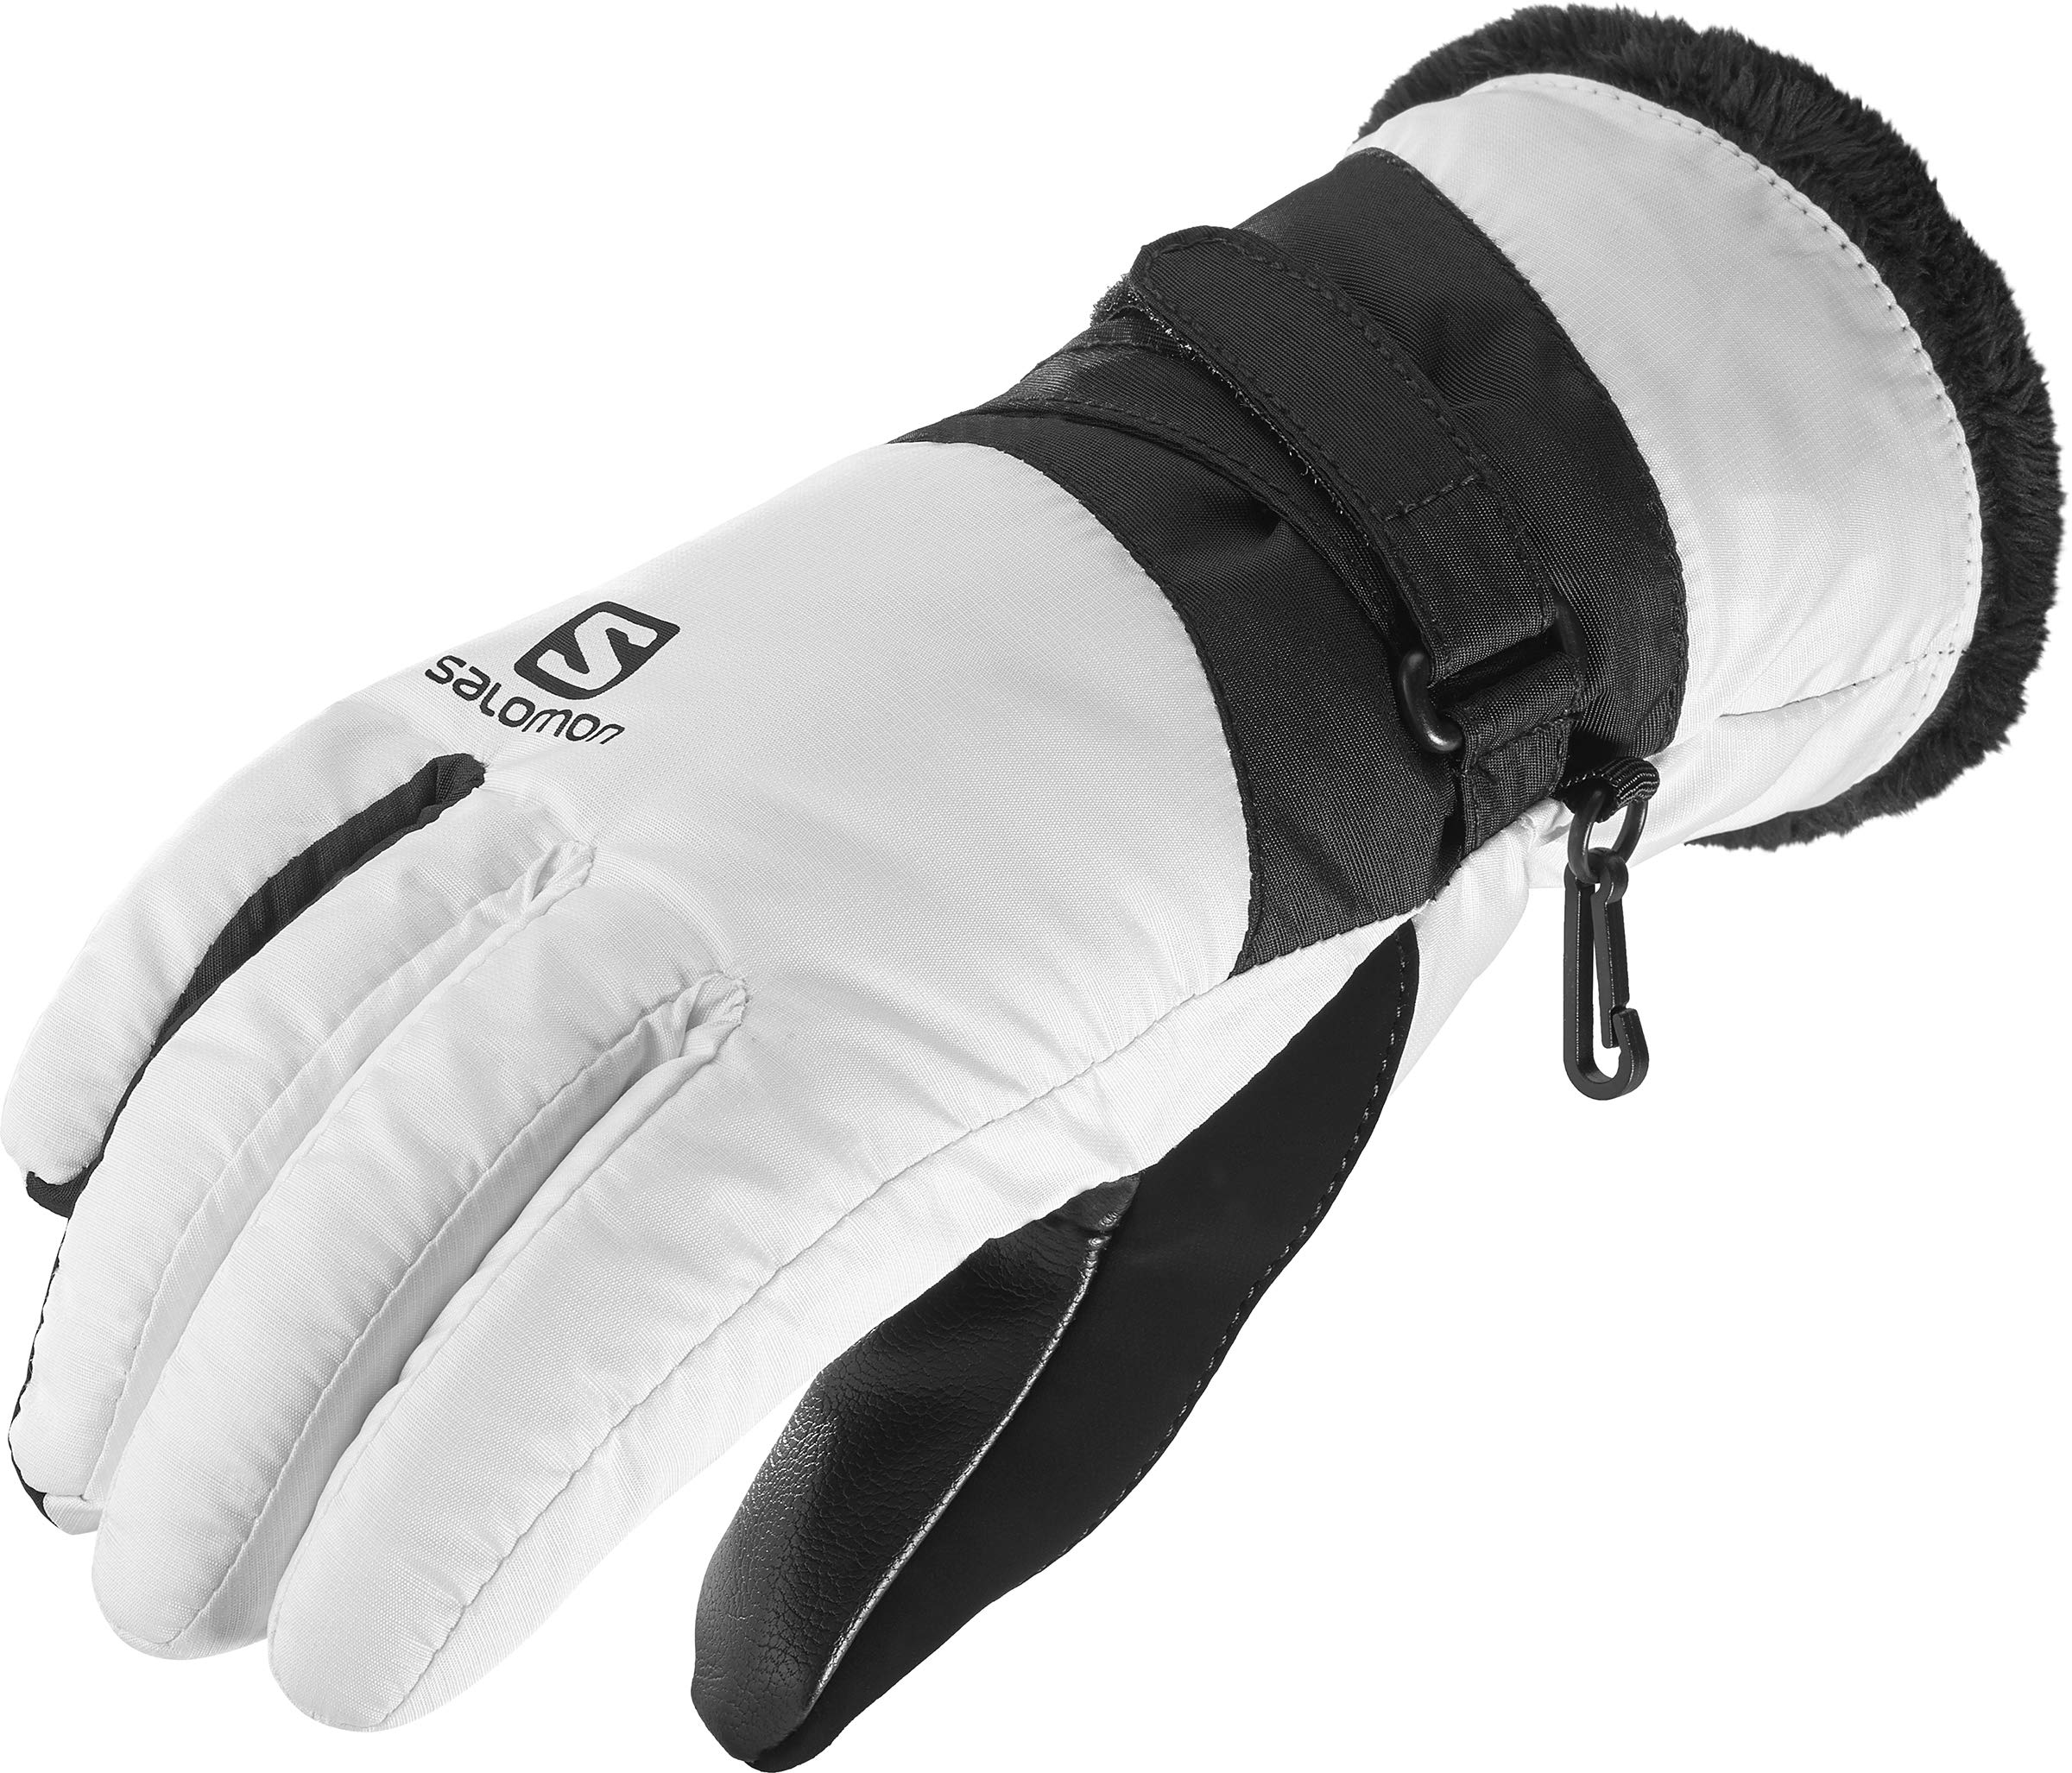 Salomon Women's Force Dry Glove, White/Black, Large